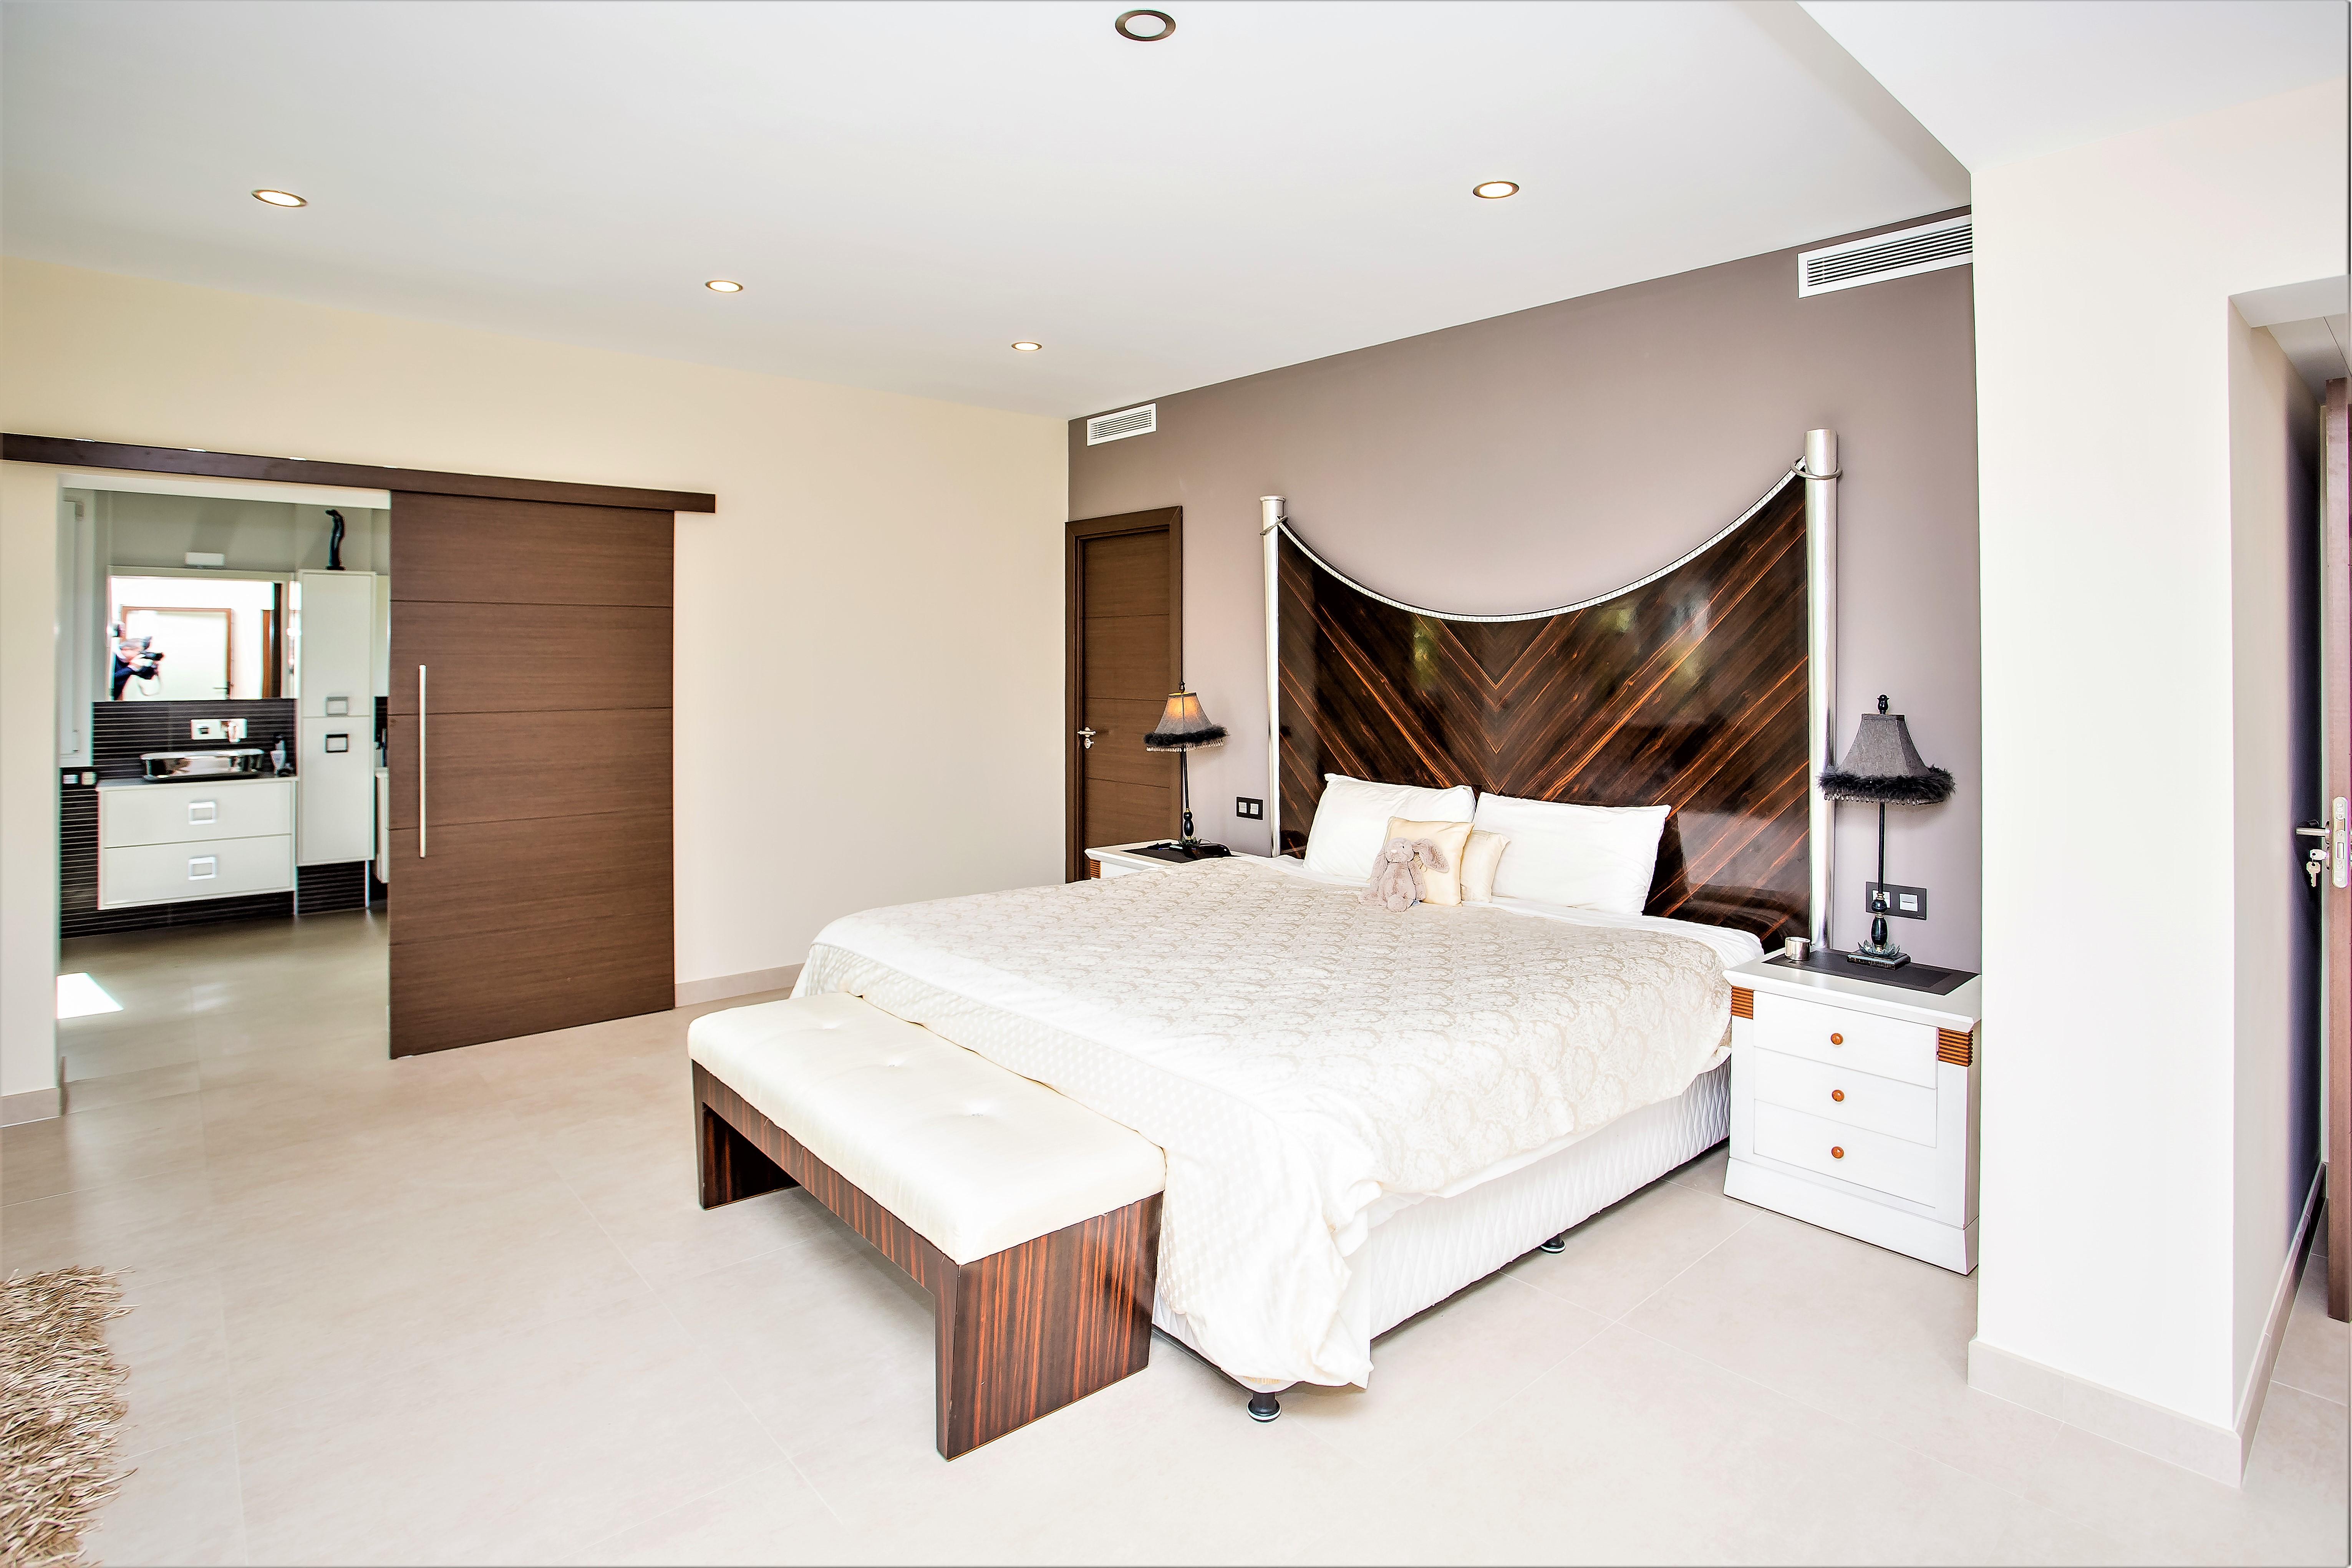 Apartment 6 B R VILLA BY PUERTO BANUS   SEA 5min                                photo 20341576